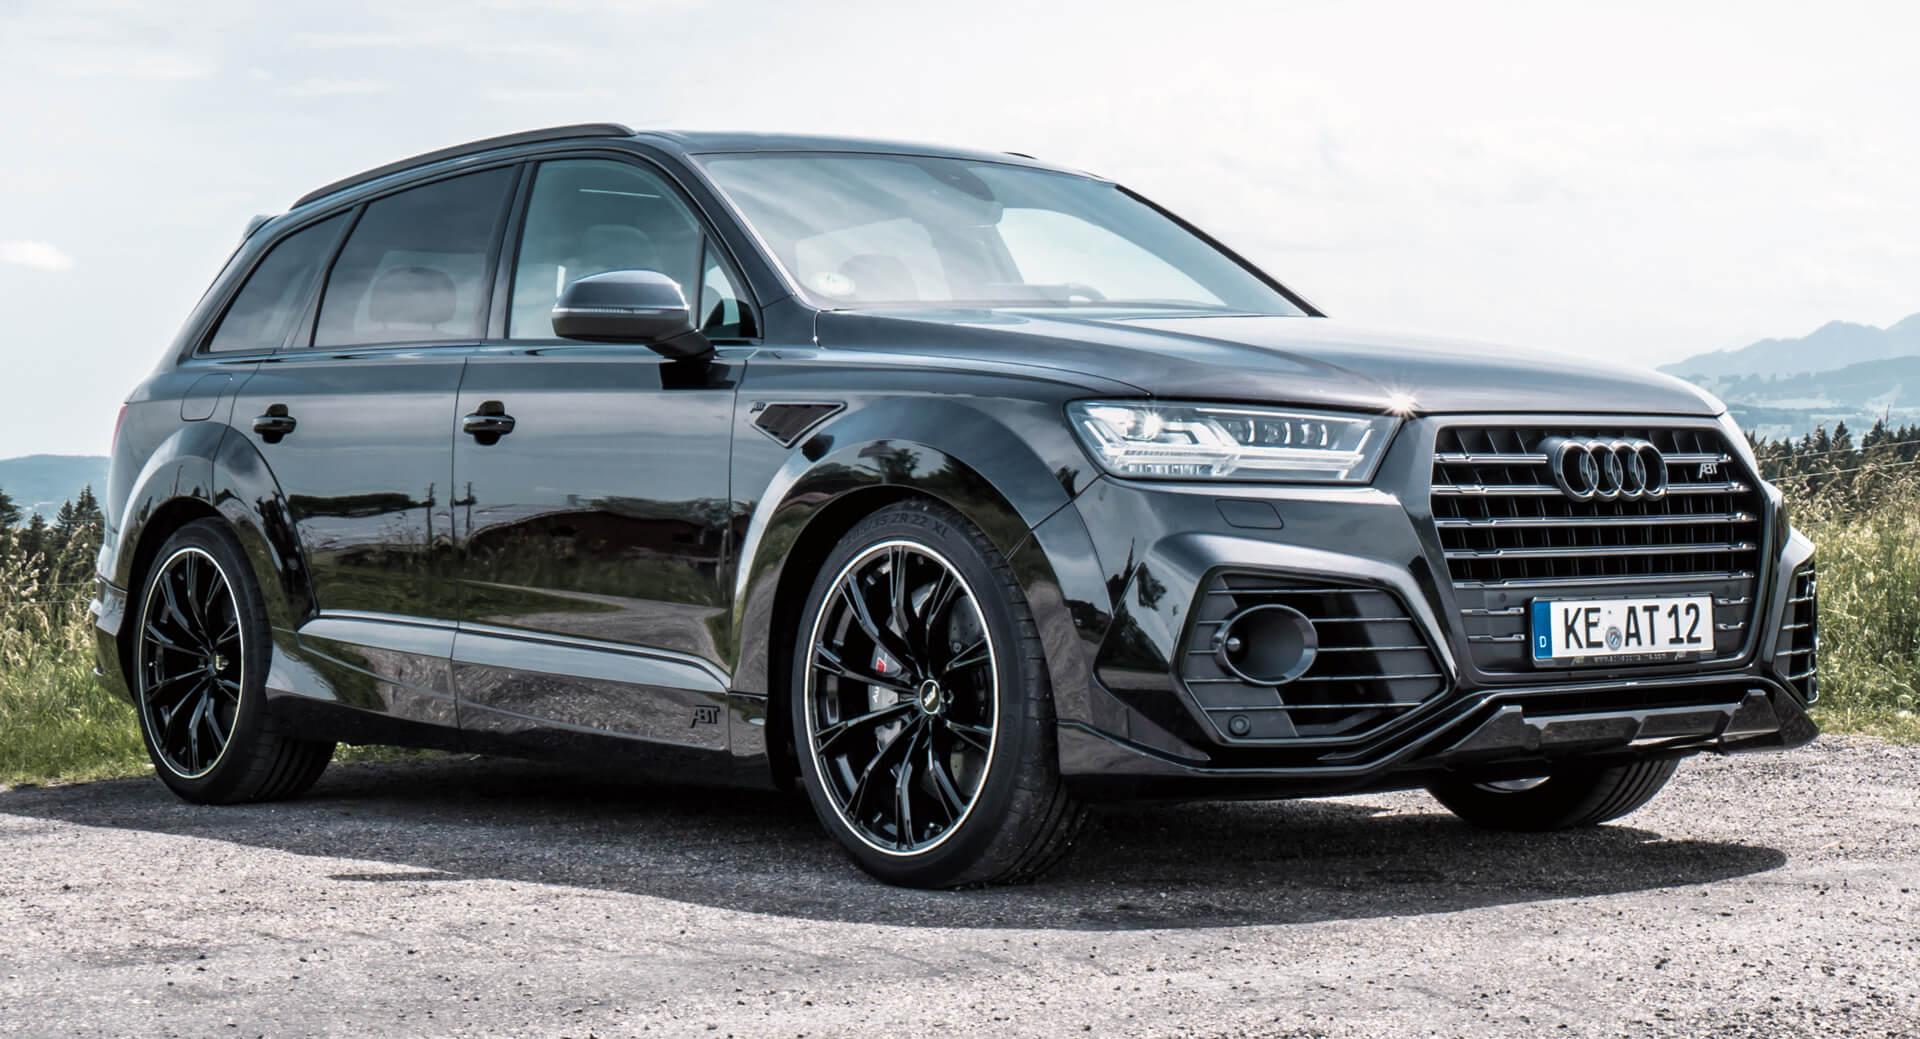 Abt Audi Q7 Konitono